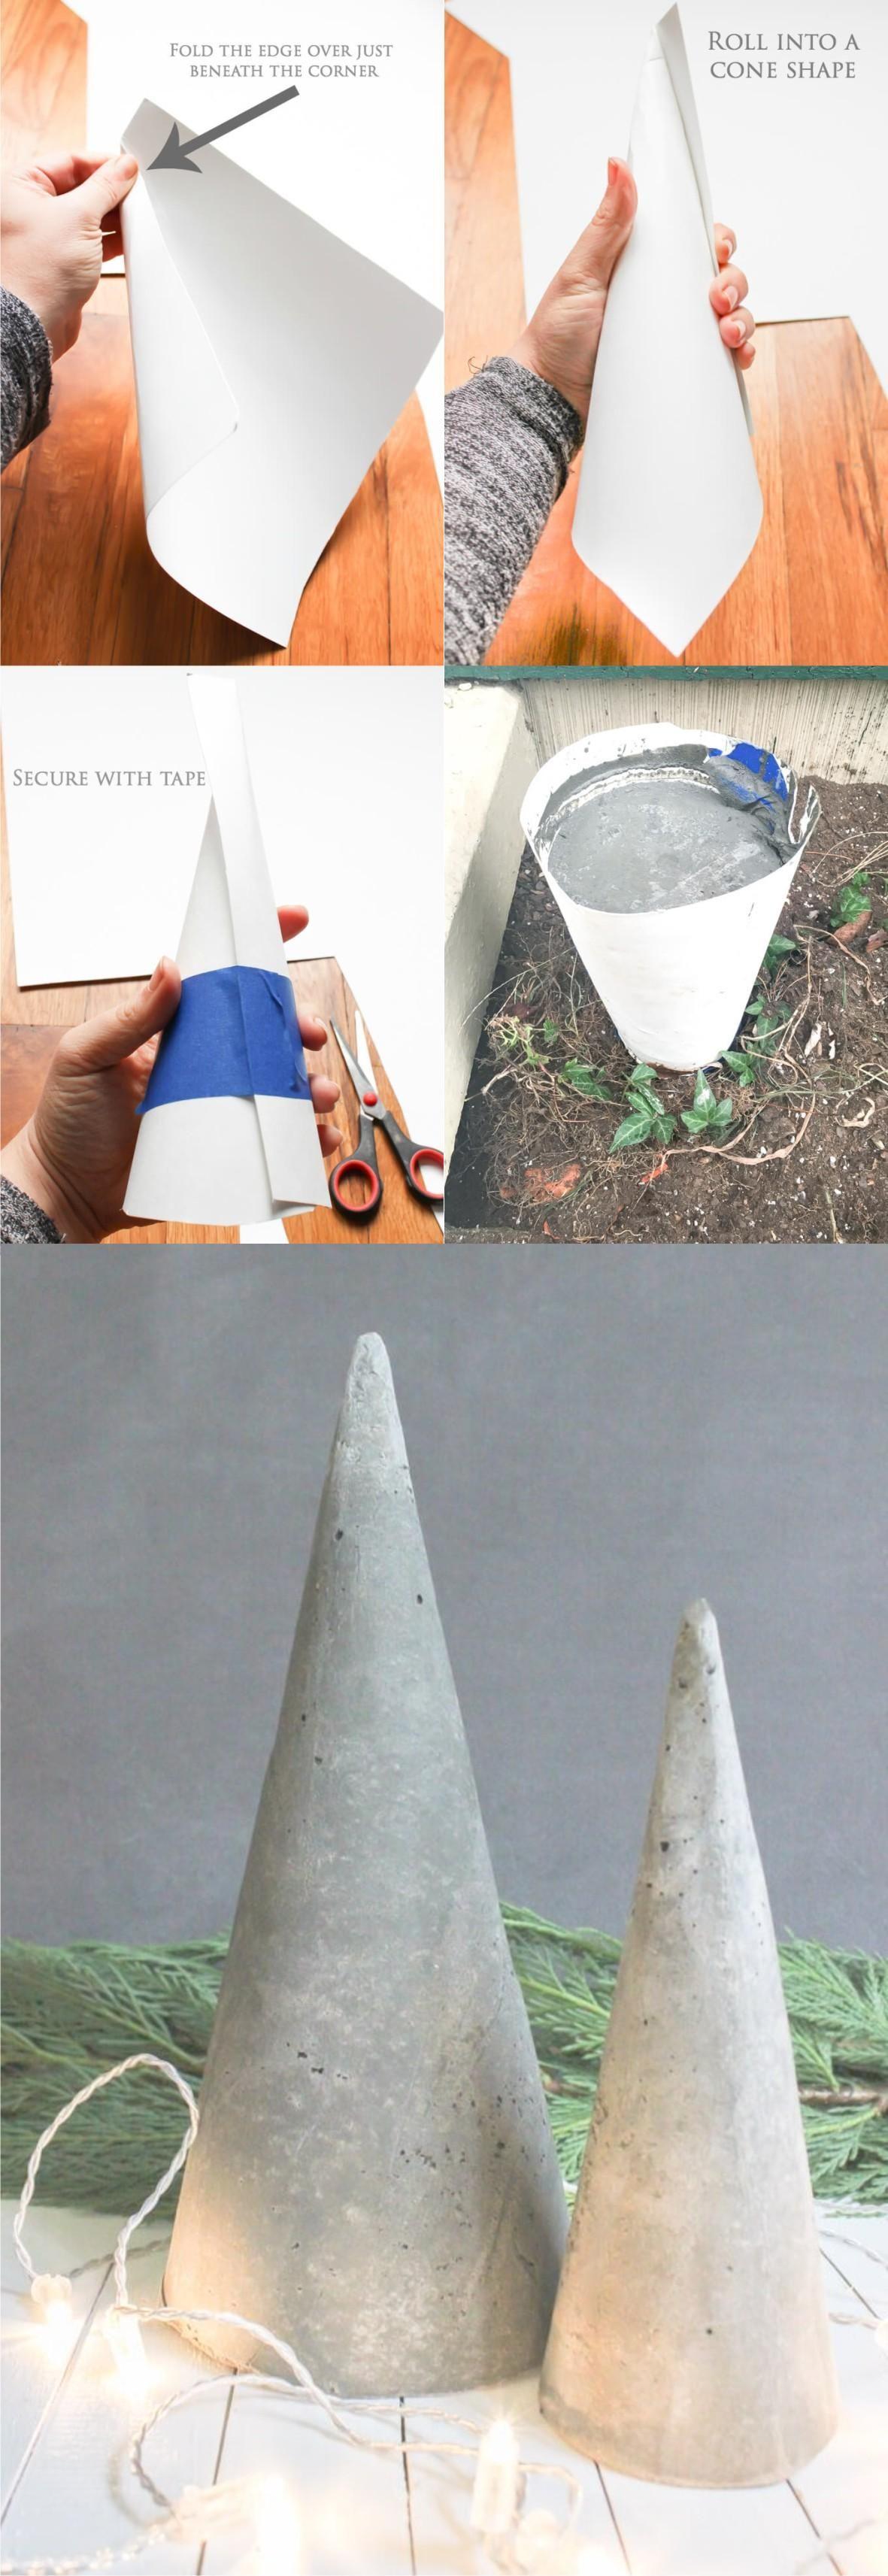 árbol De Navidad Con Cemento Wickedspatula Com Concreto Diy Artesanato Concretas Trabalhos Manuais Com Plástico